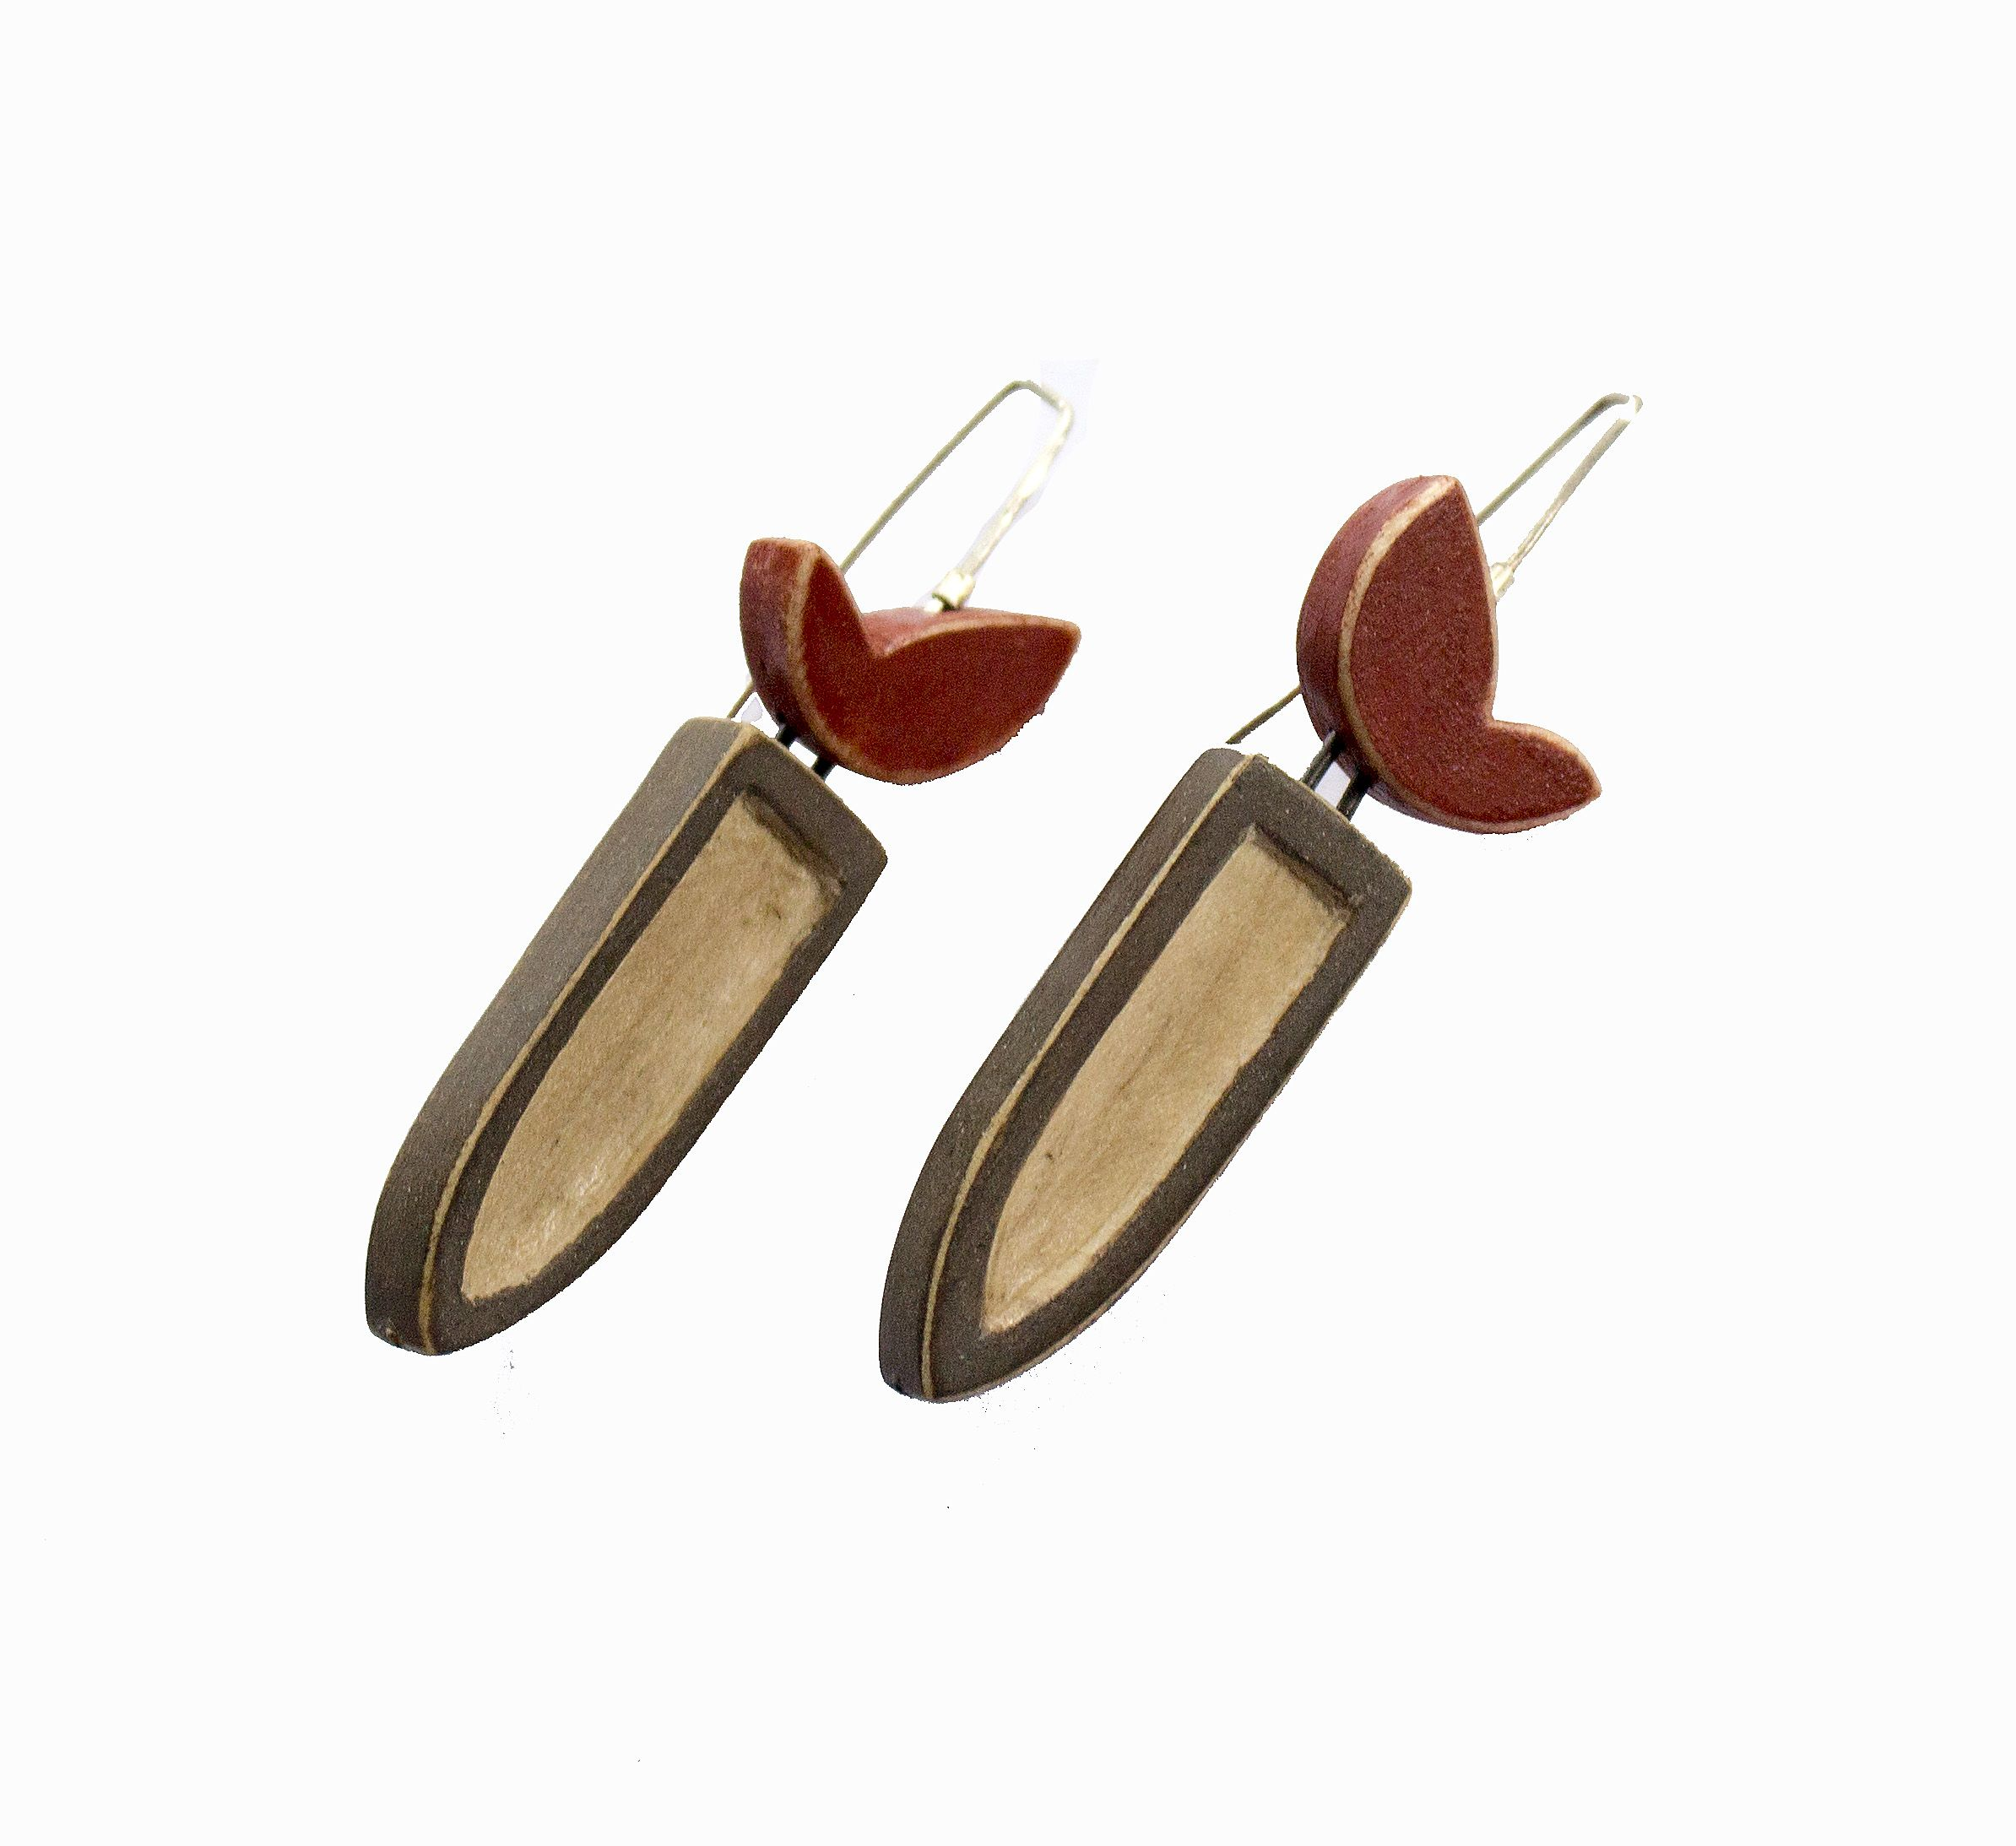 Audrey Peck, Bloom earrings, wood and sterling